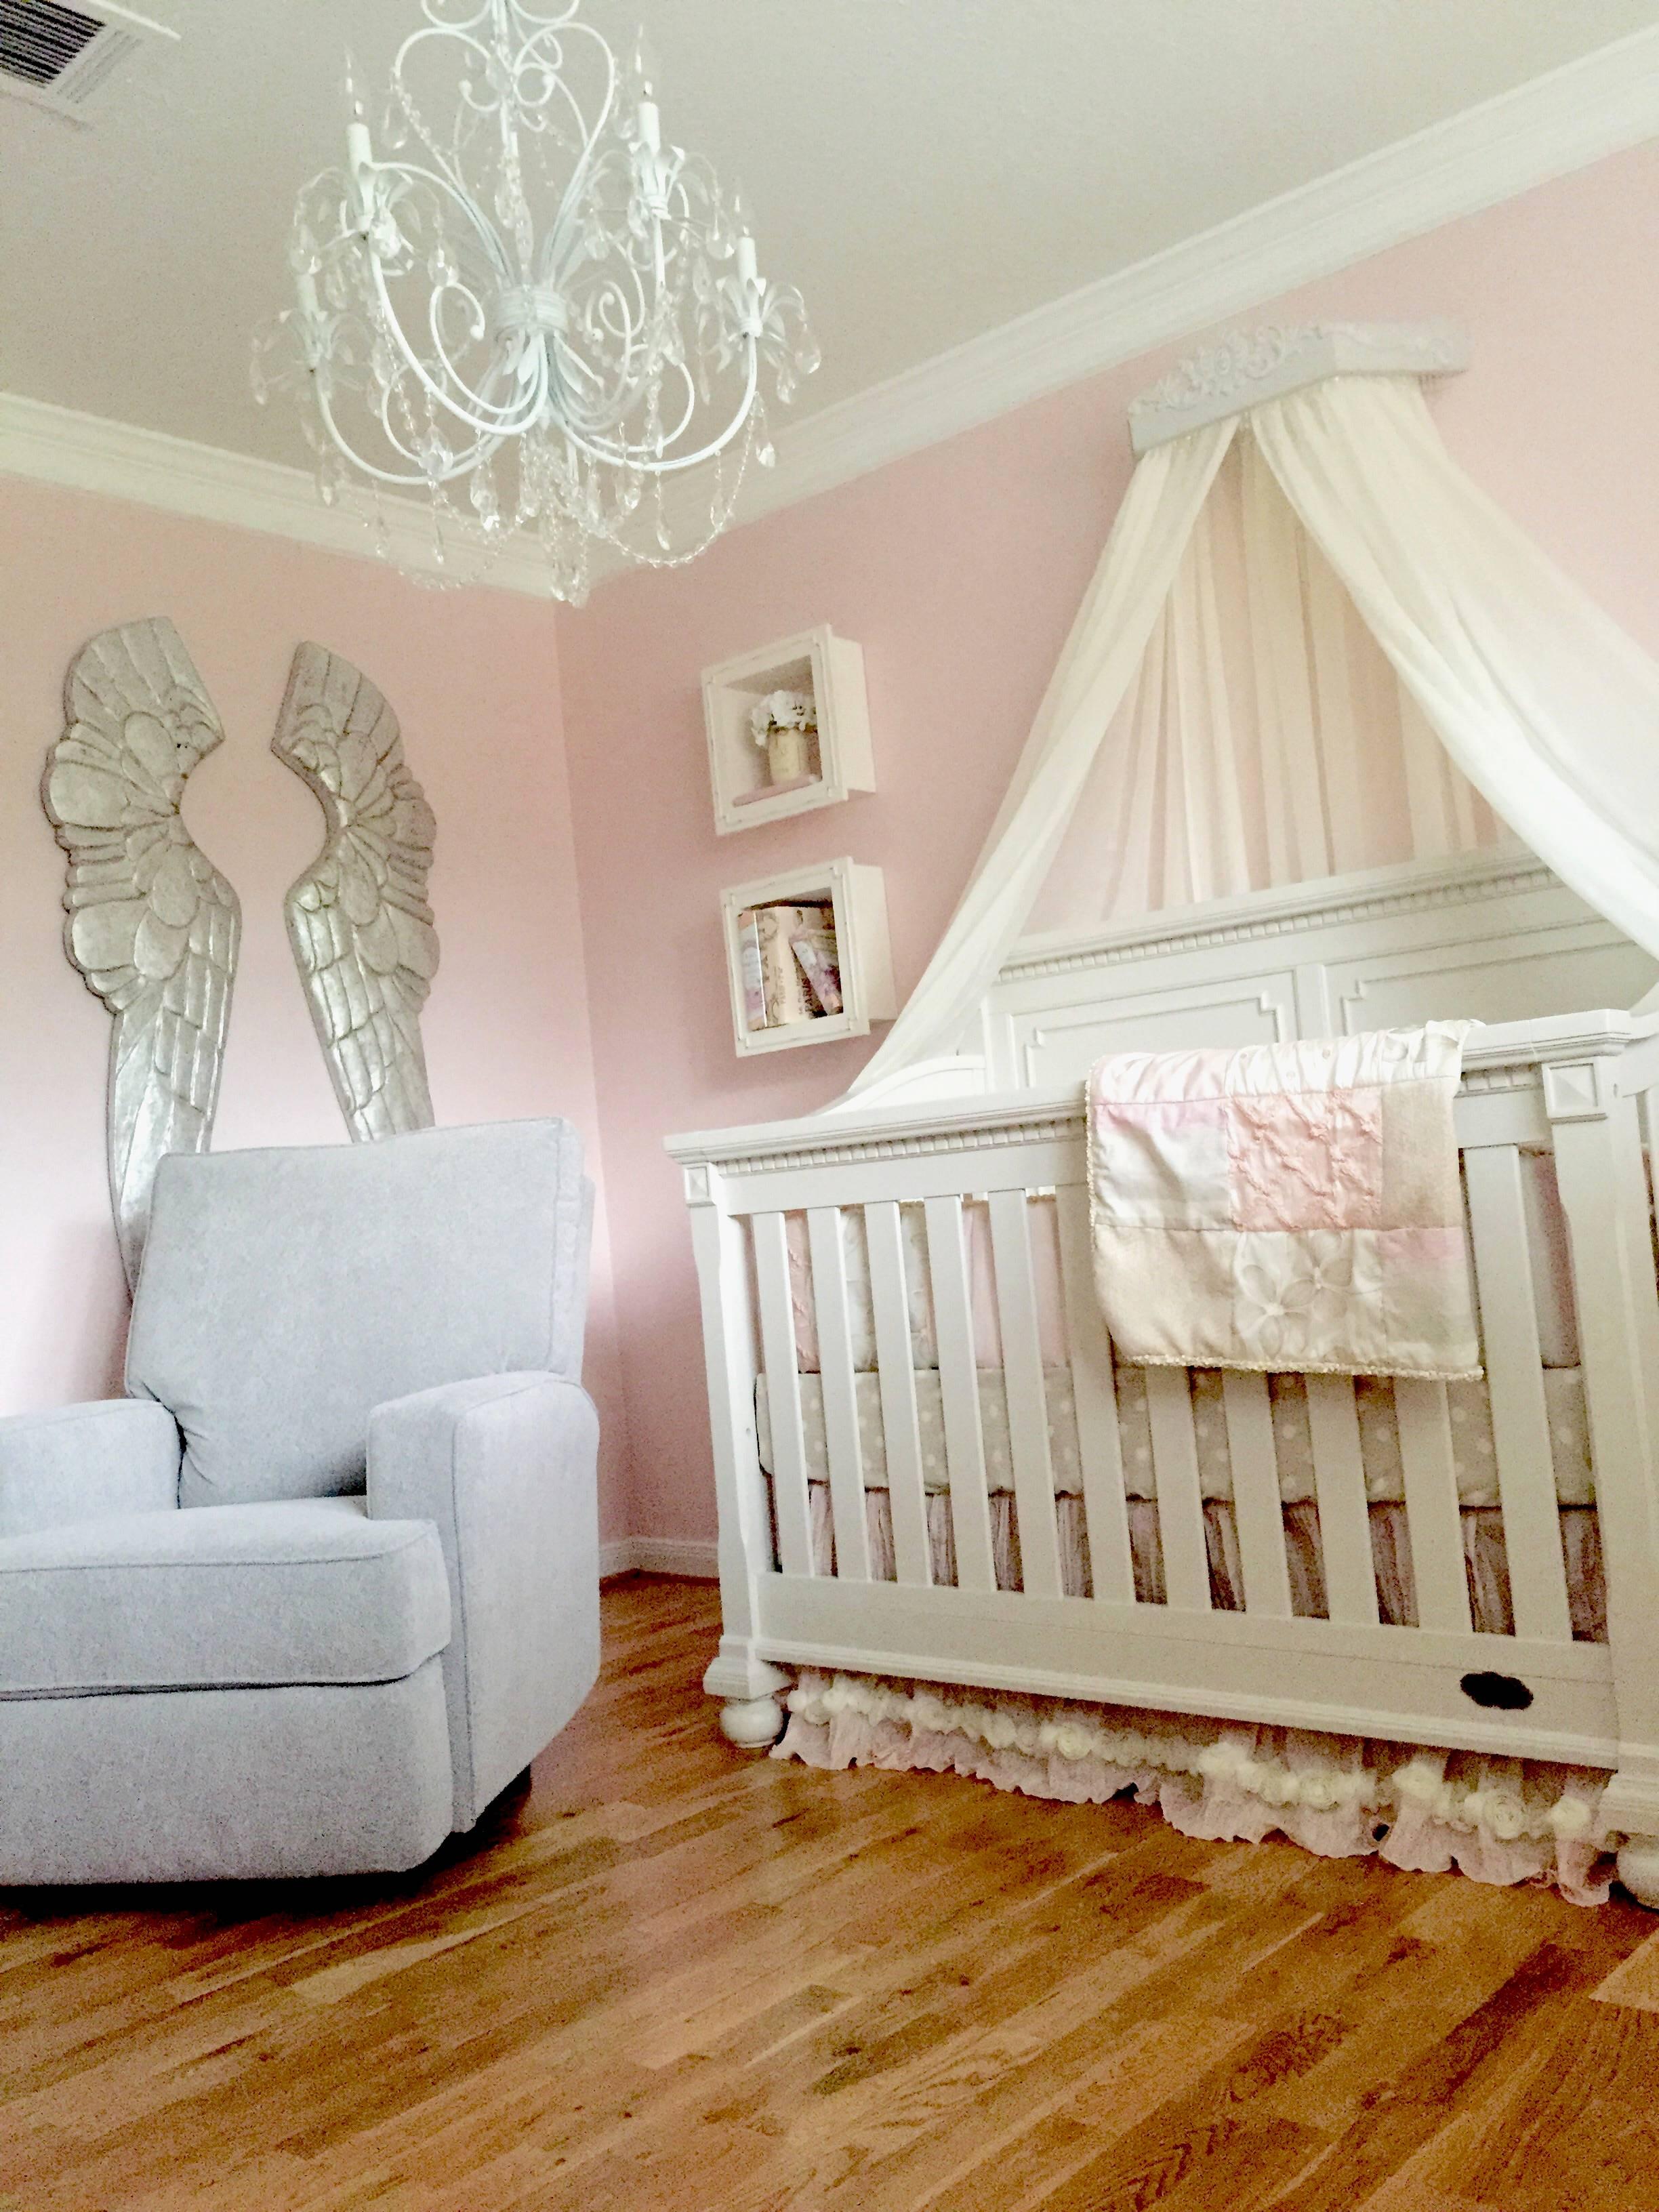 Boy Toddler Decor Room Wall